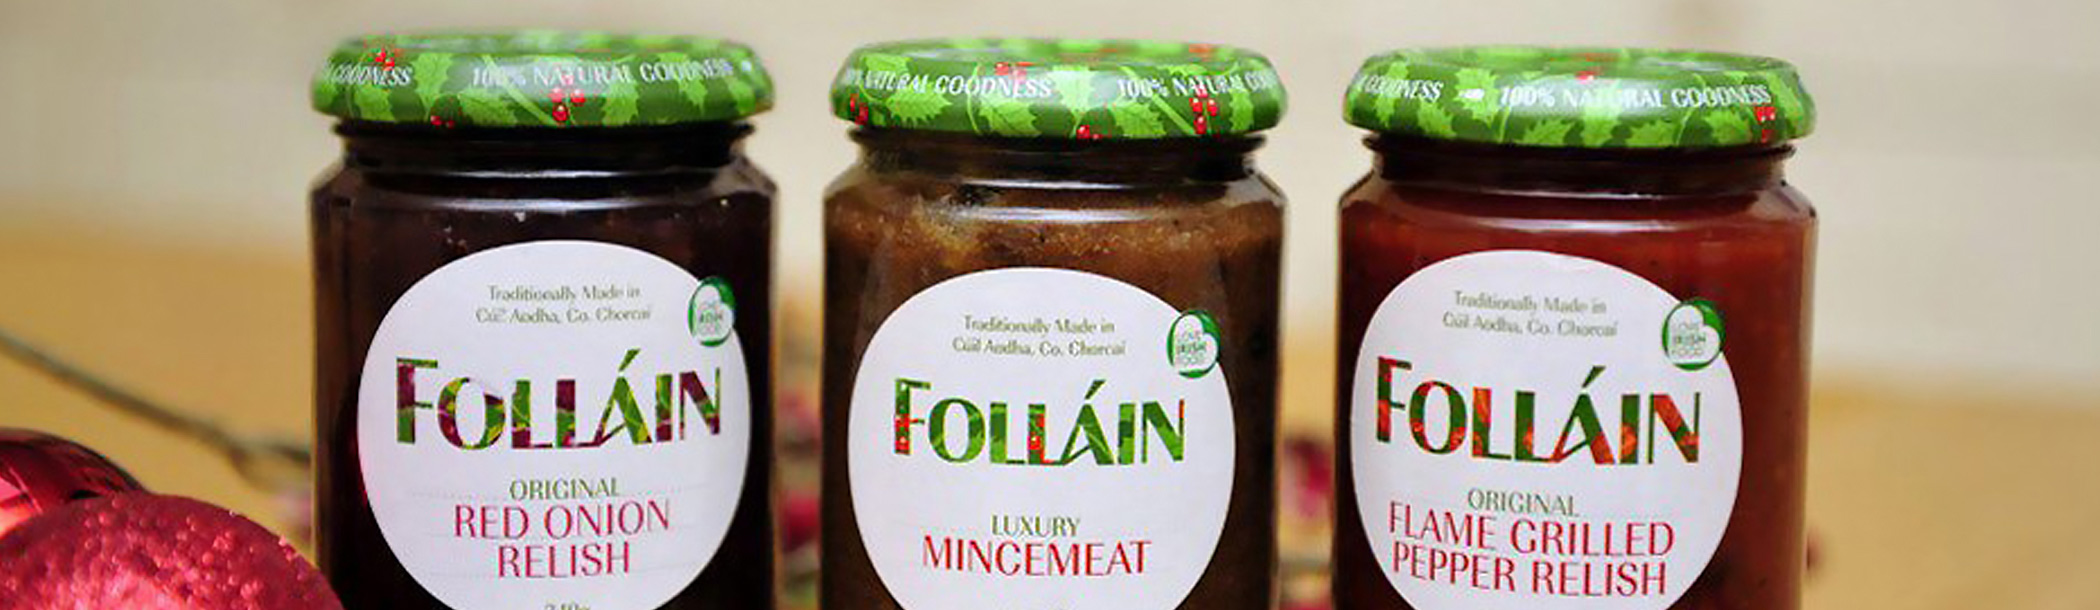 gno-means-business-Banner Folláin